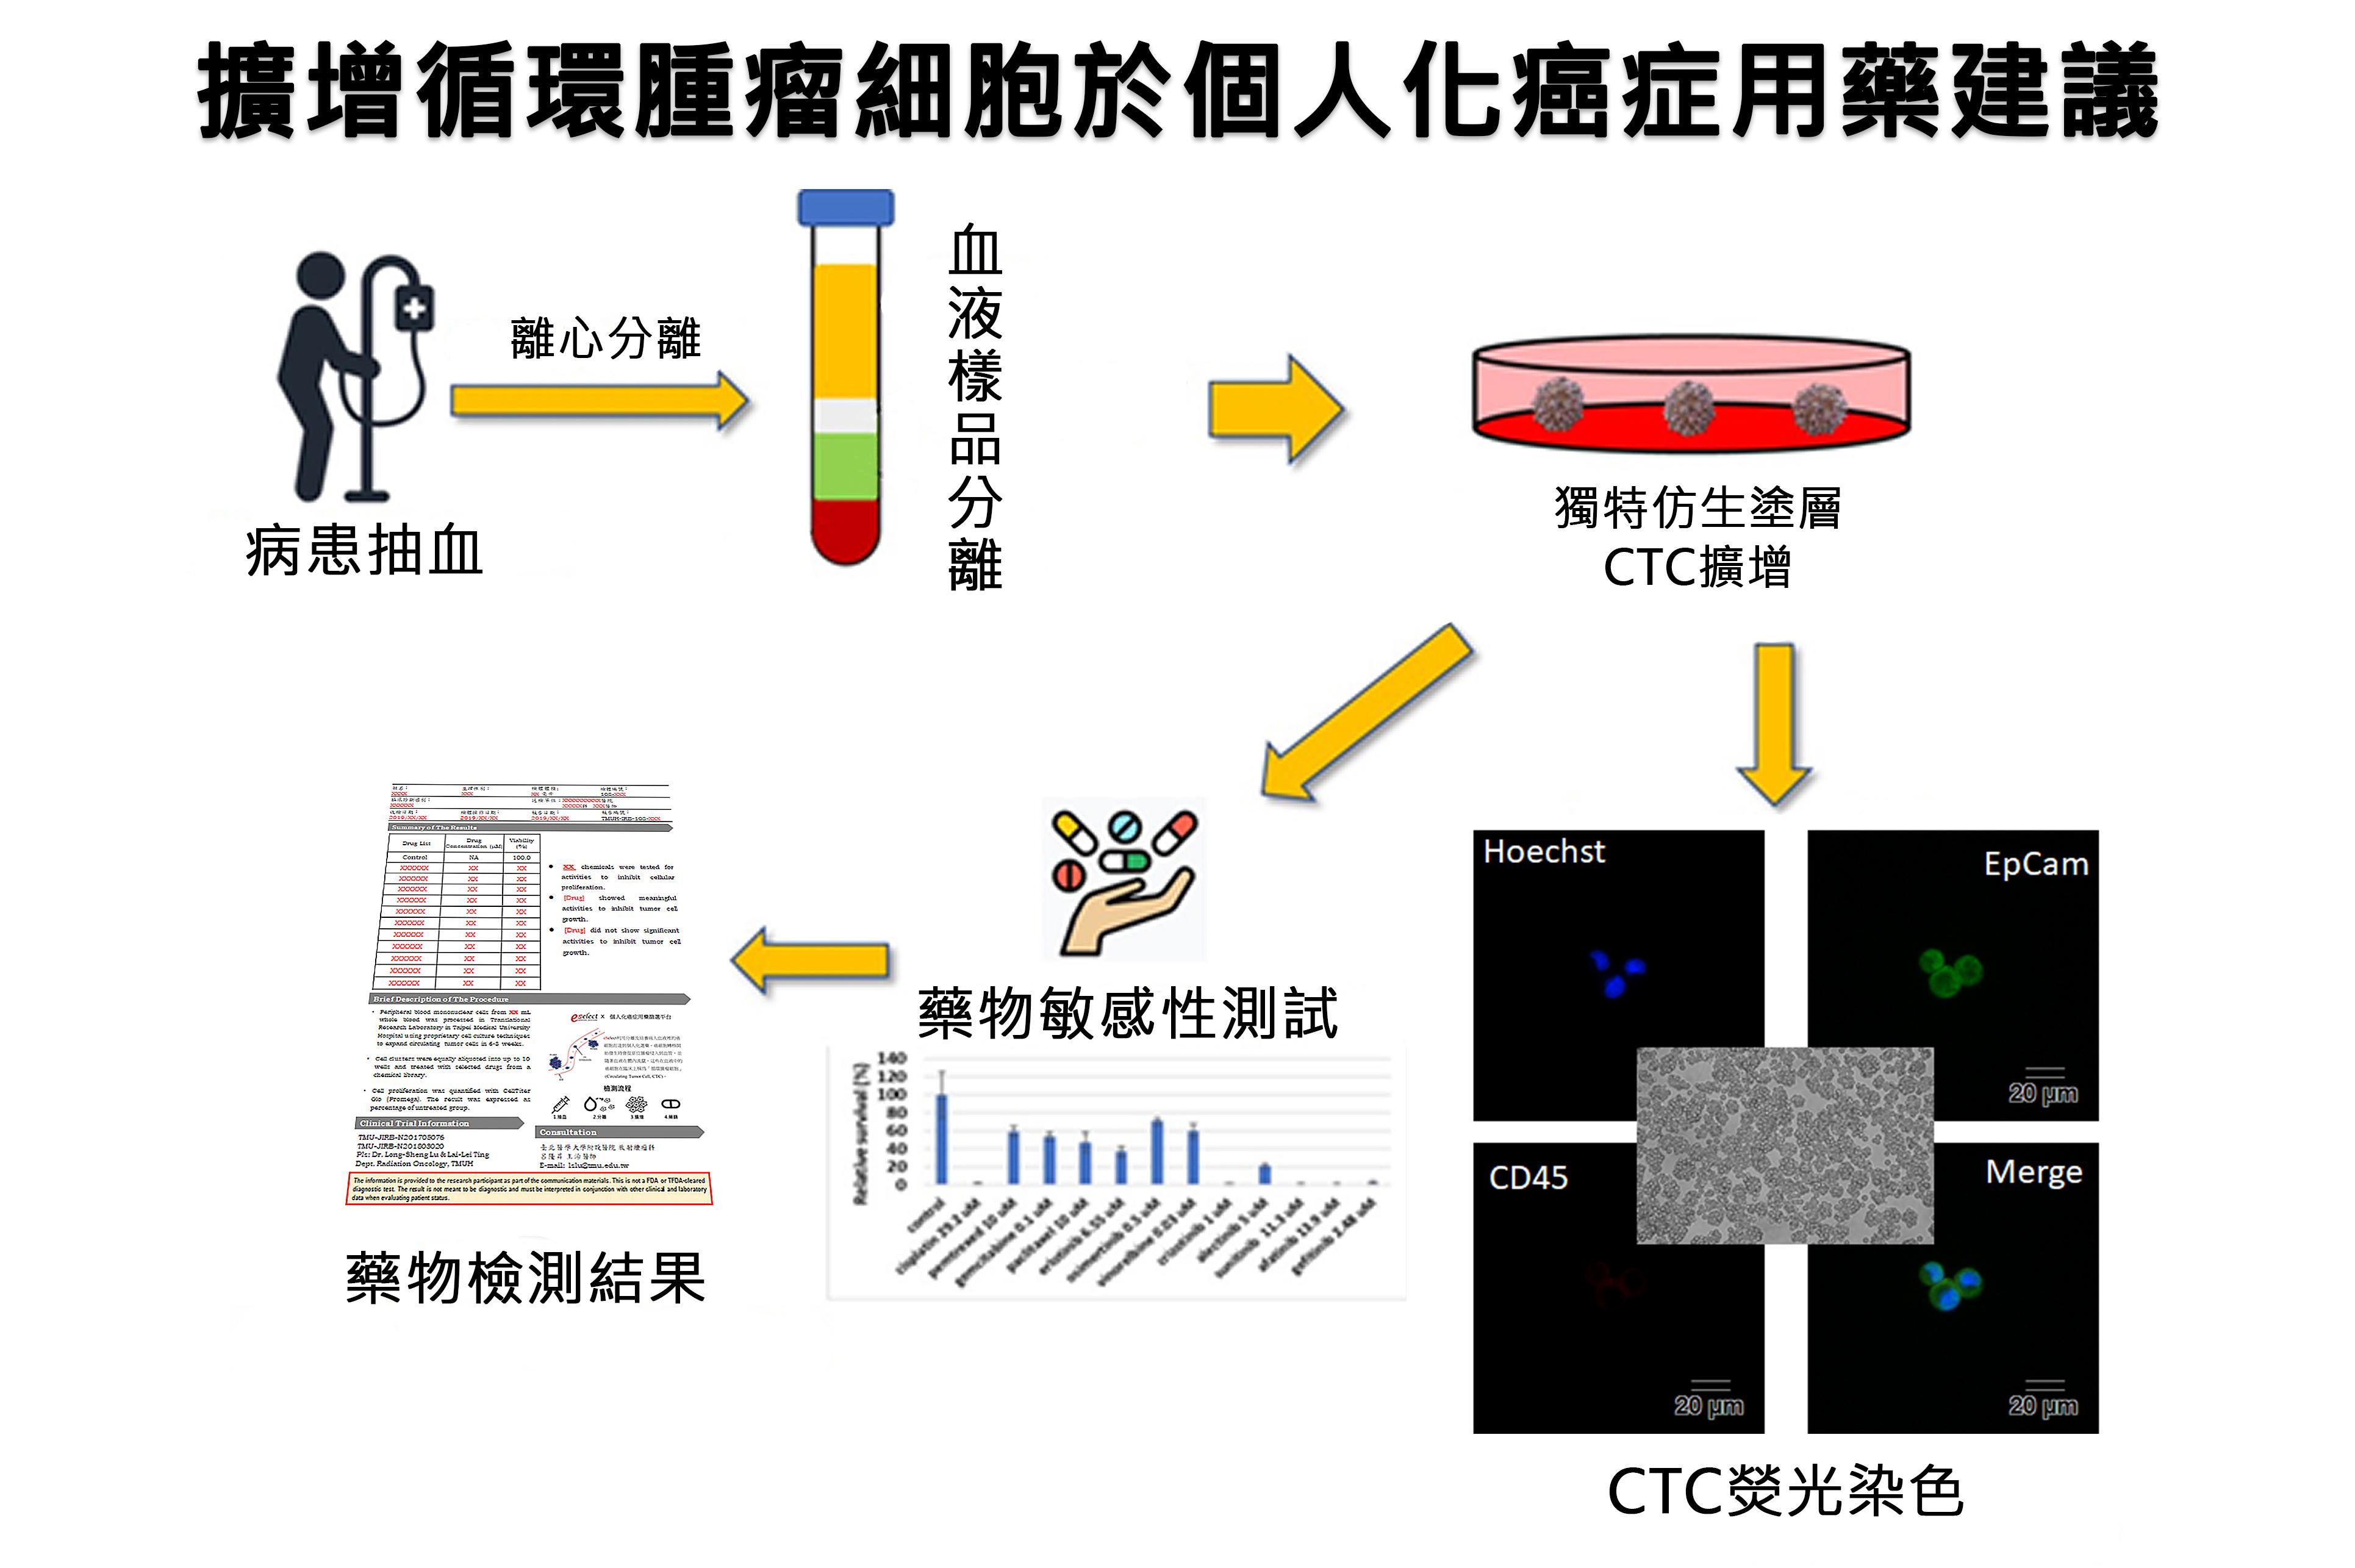 CTC擴增技術個人化癌症藥物測試流程